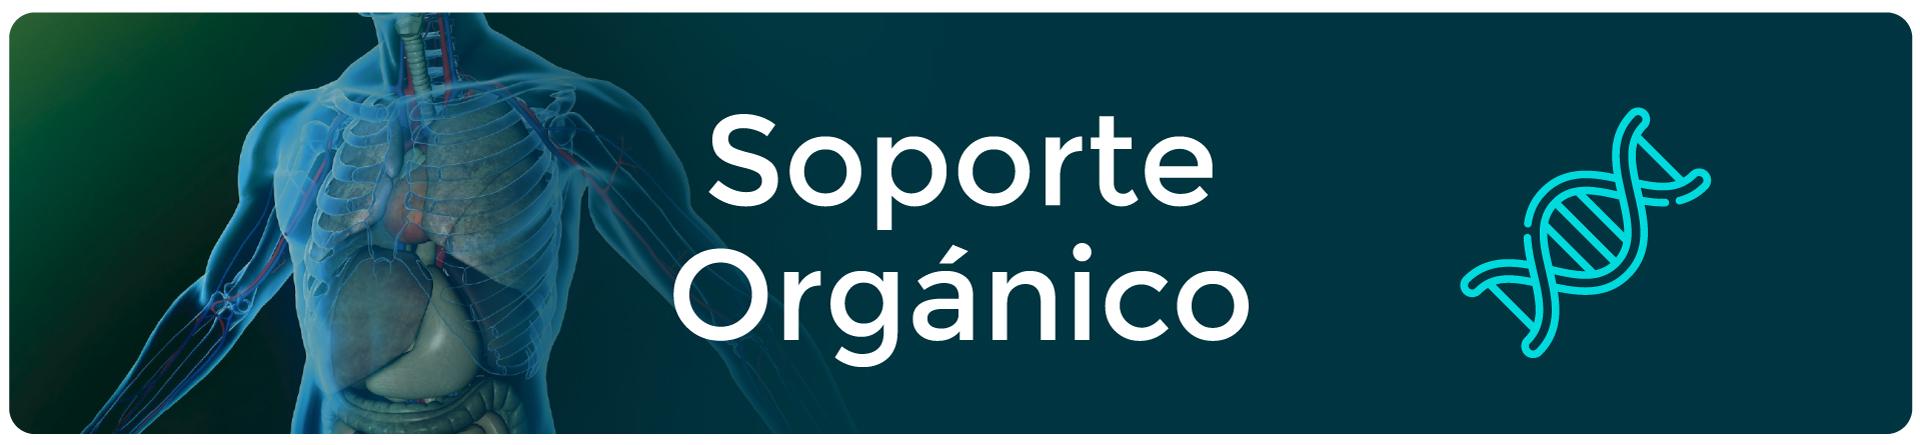 Soporte Orgánico